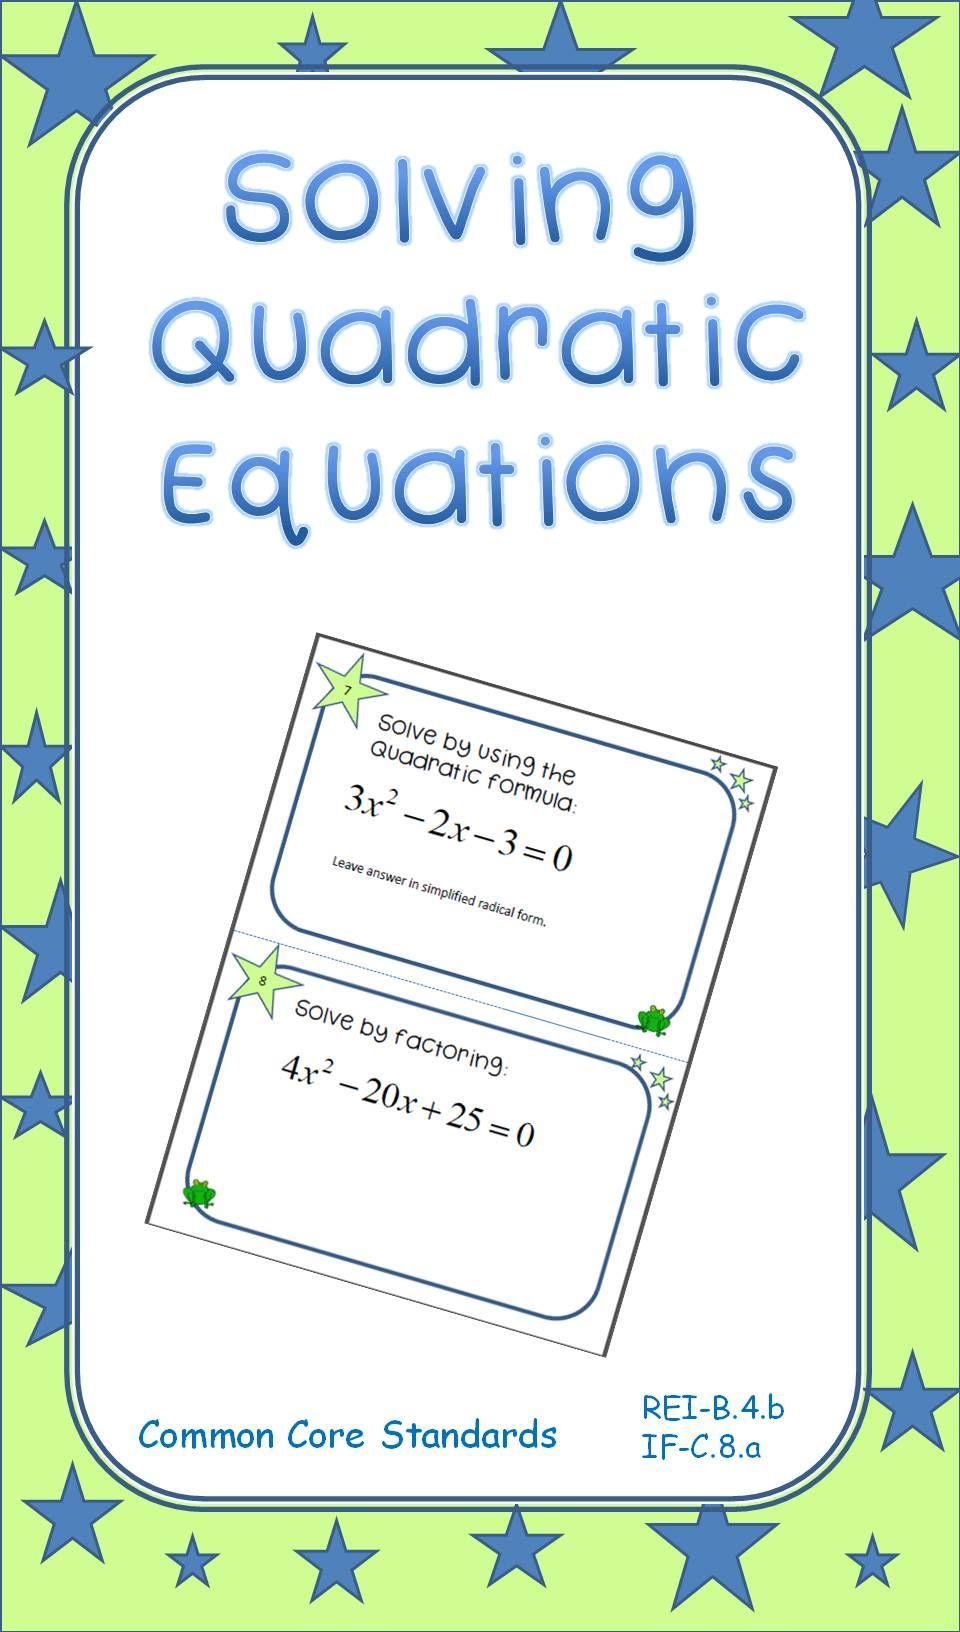 Solving Quadratic Equations Task Cards Quadratics Quadratic Equation Task Cards [ 1632 x 960 Pixel ]